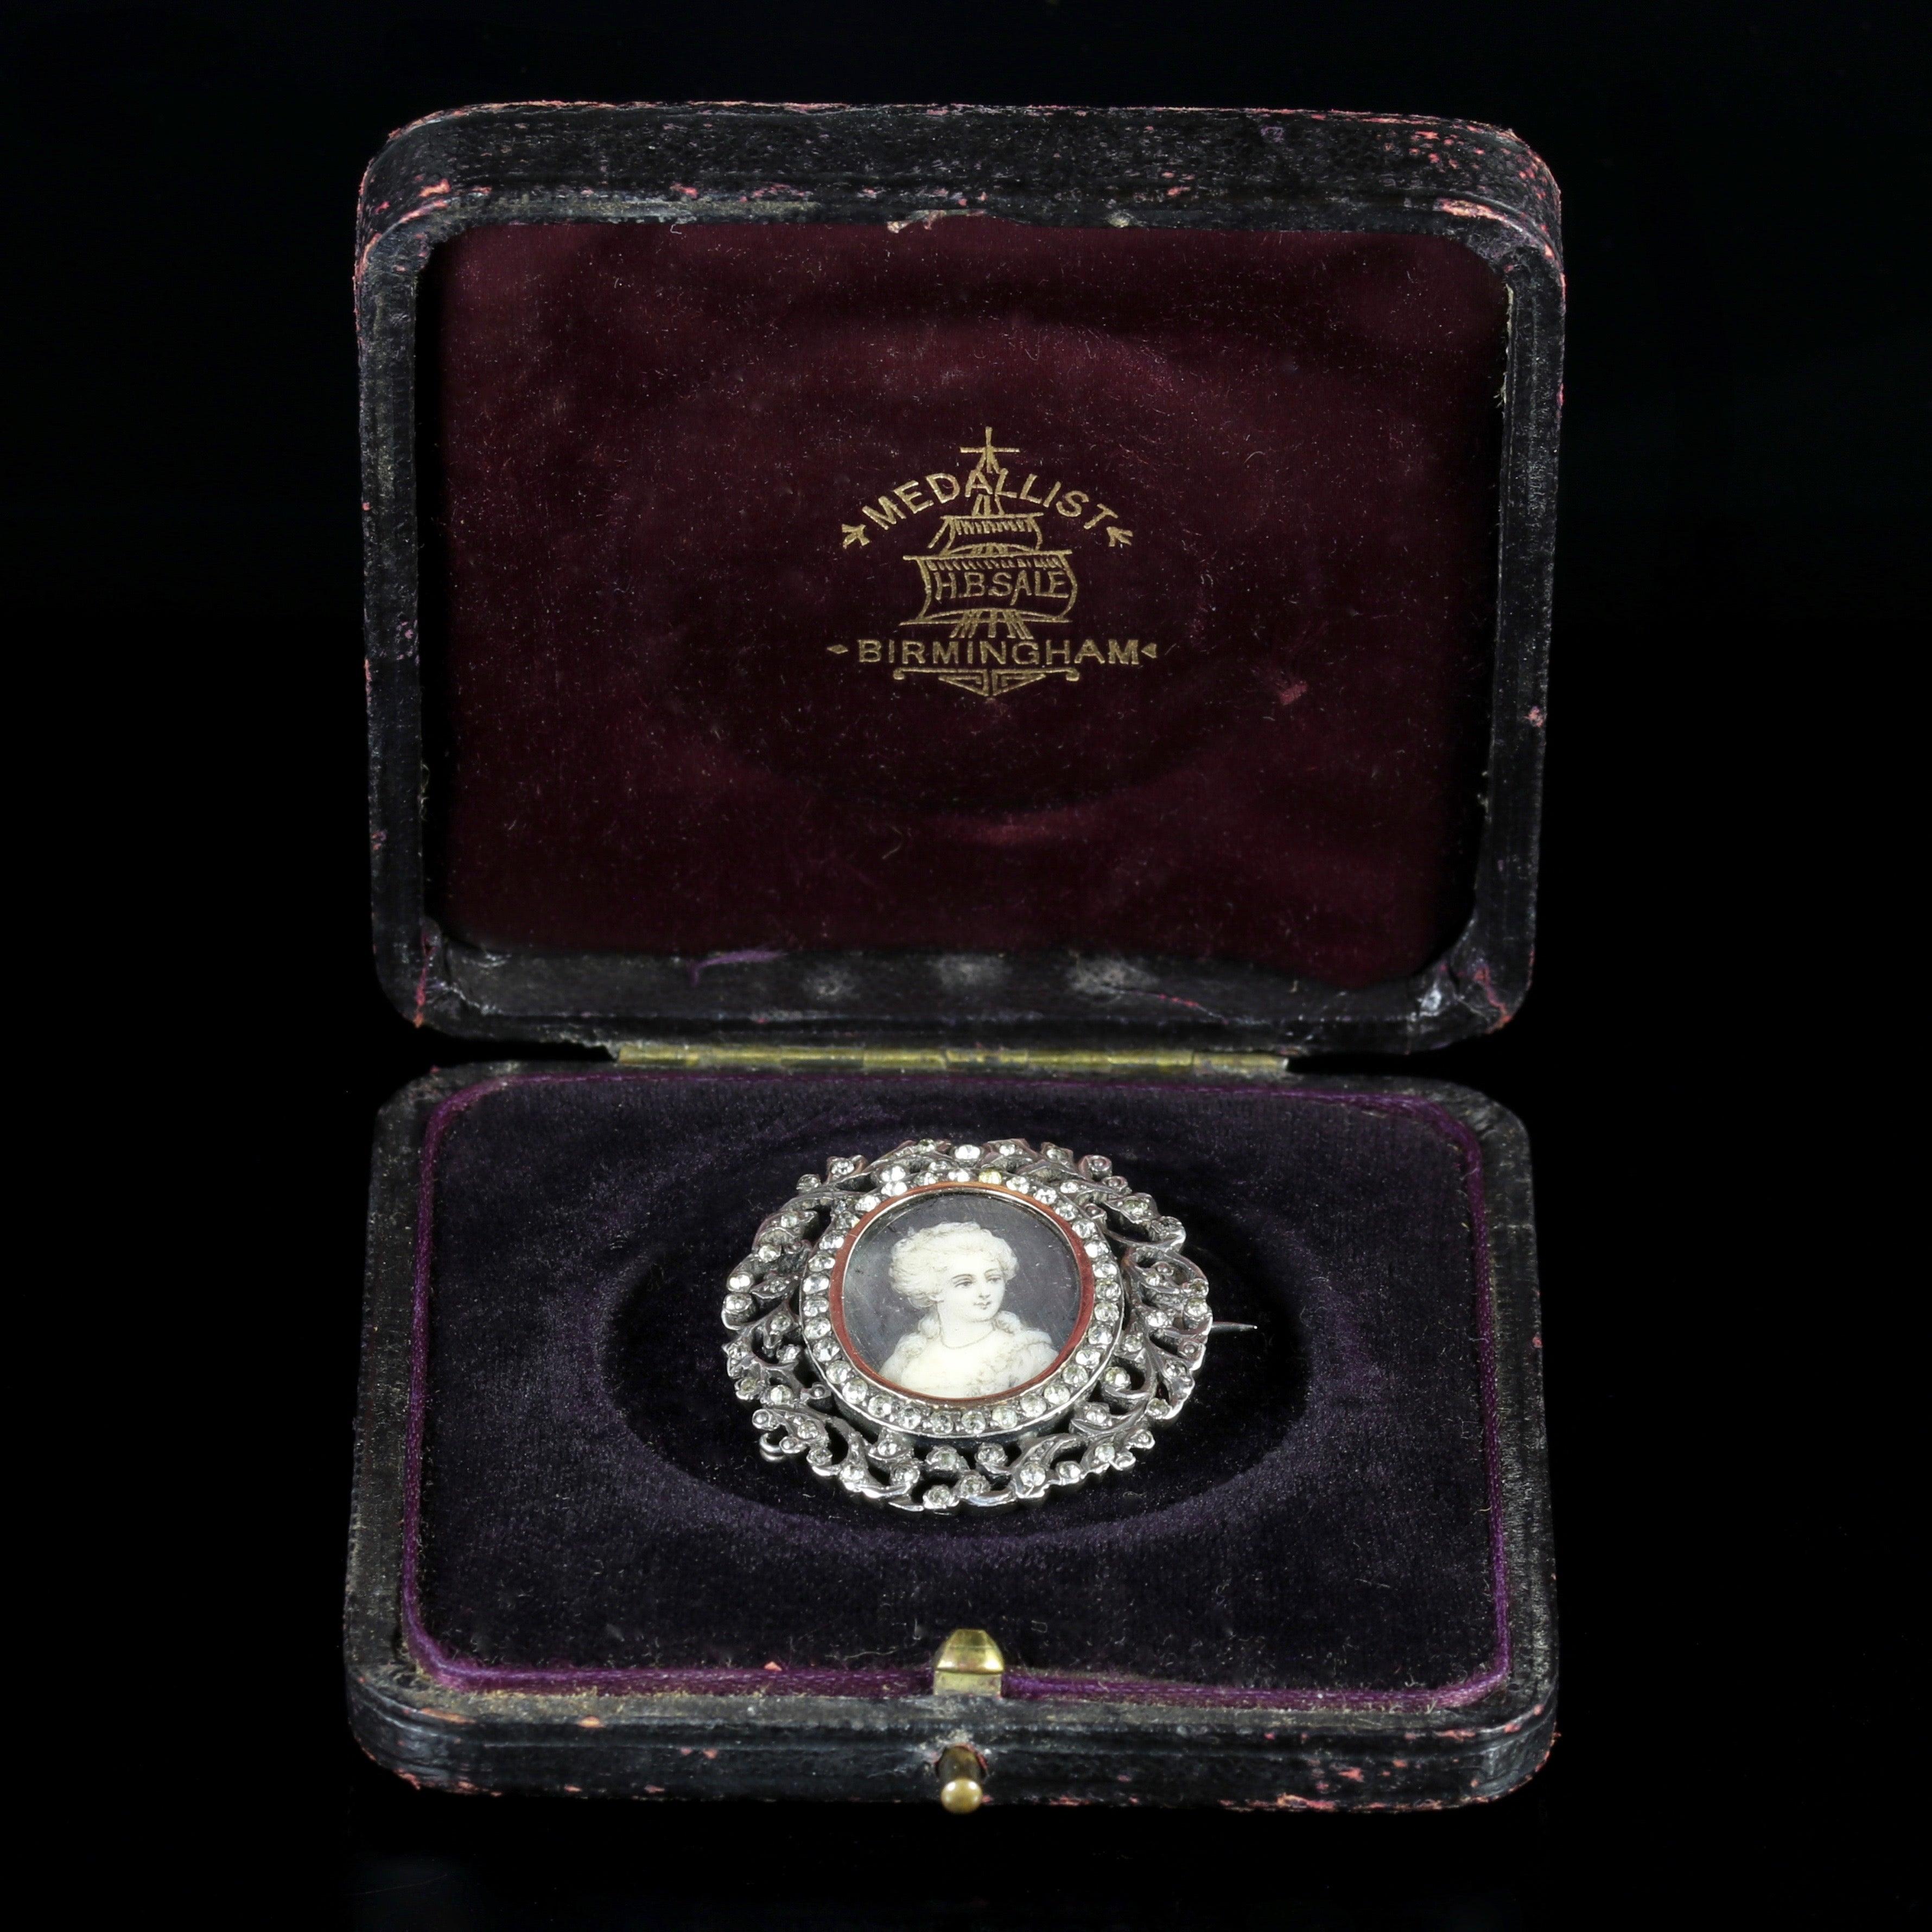 Antique Georgian Paste Stones Sterling Silver Miniature Brooch For Walet Black Soap Original Box Diamond Sale At 1stdibs